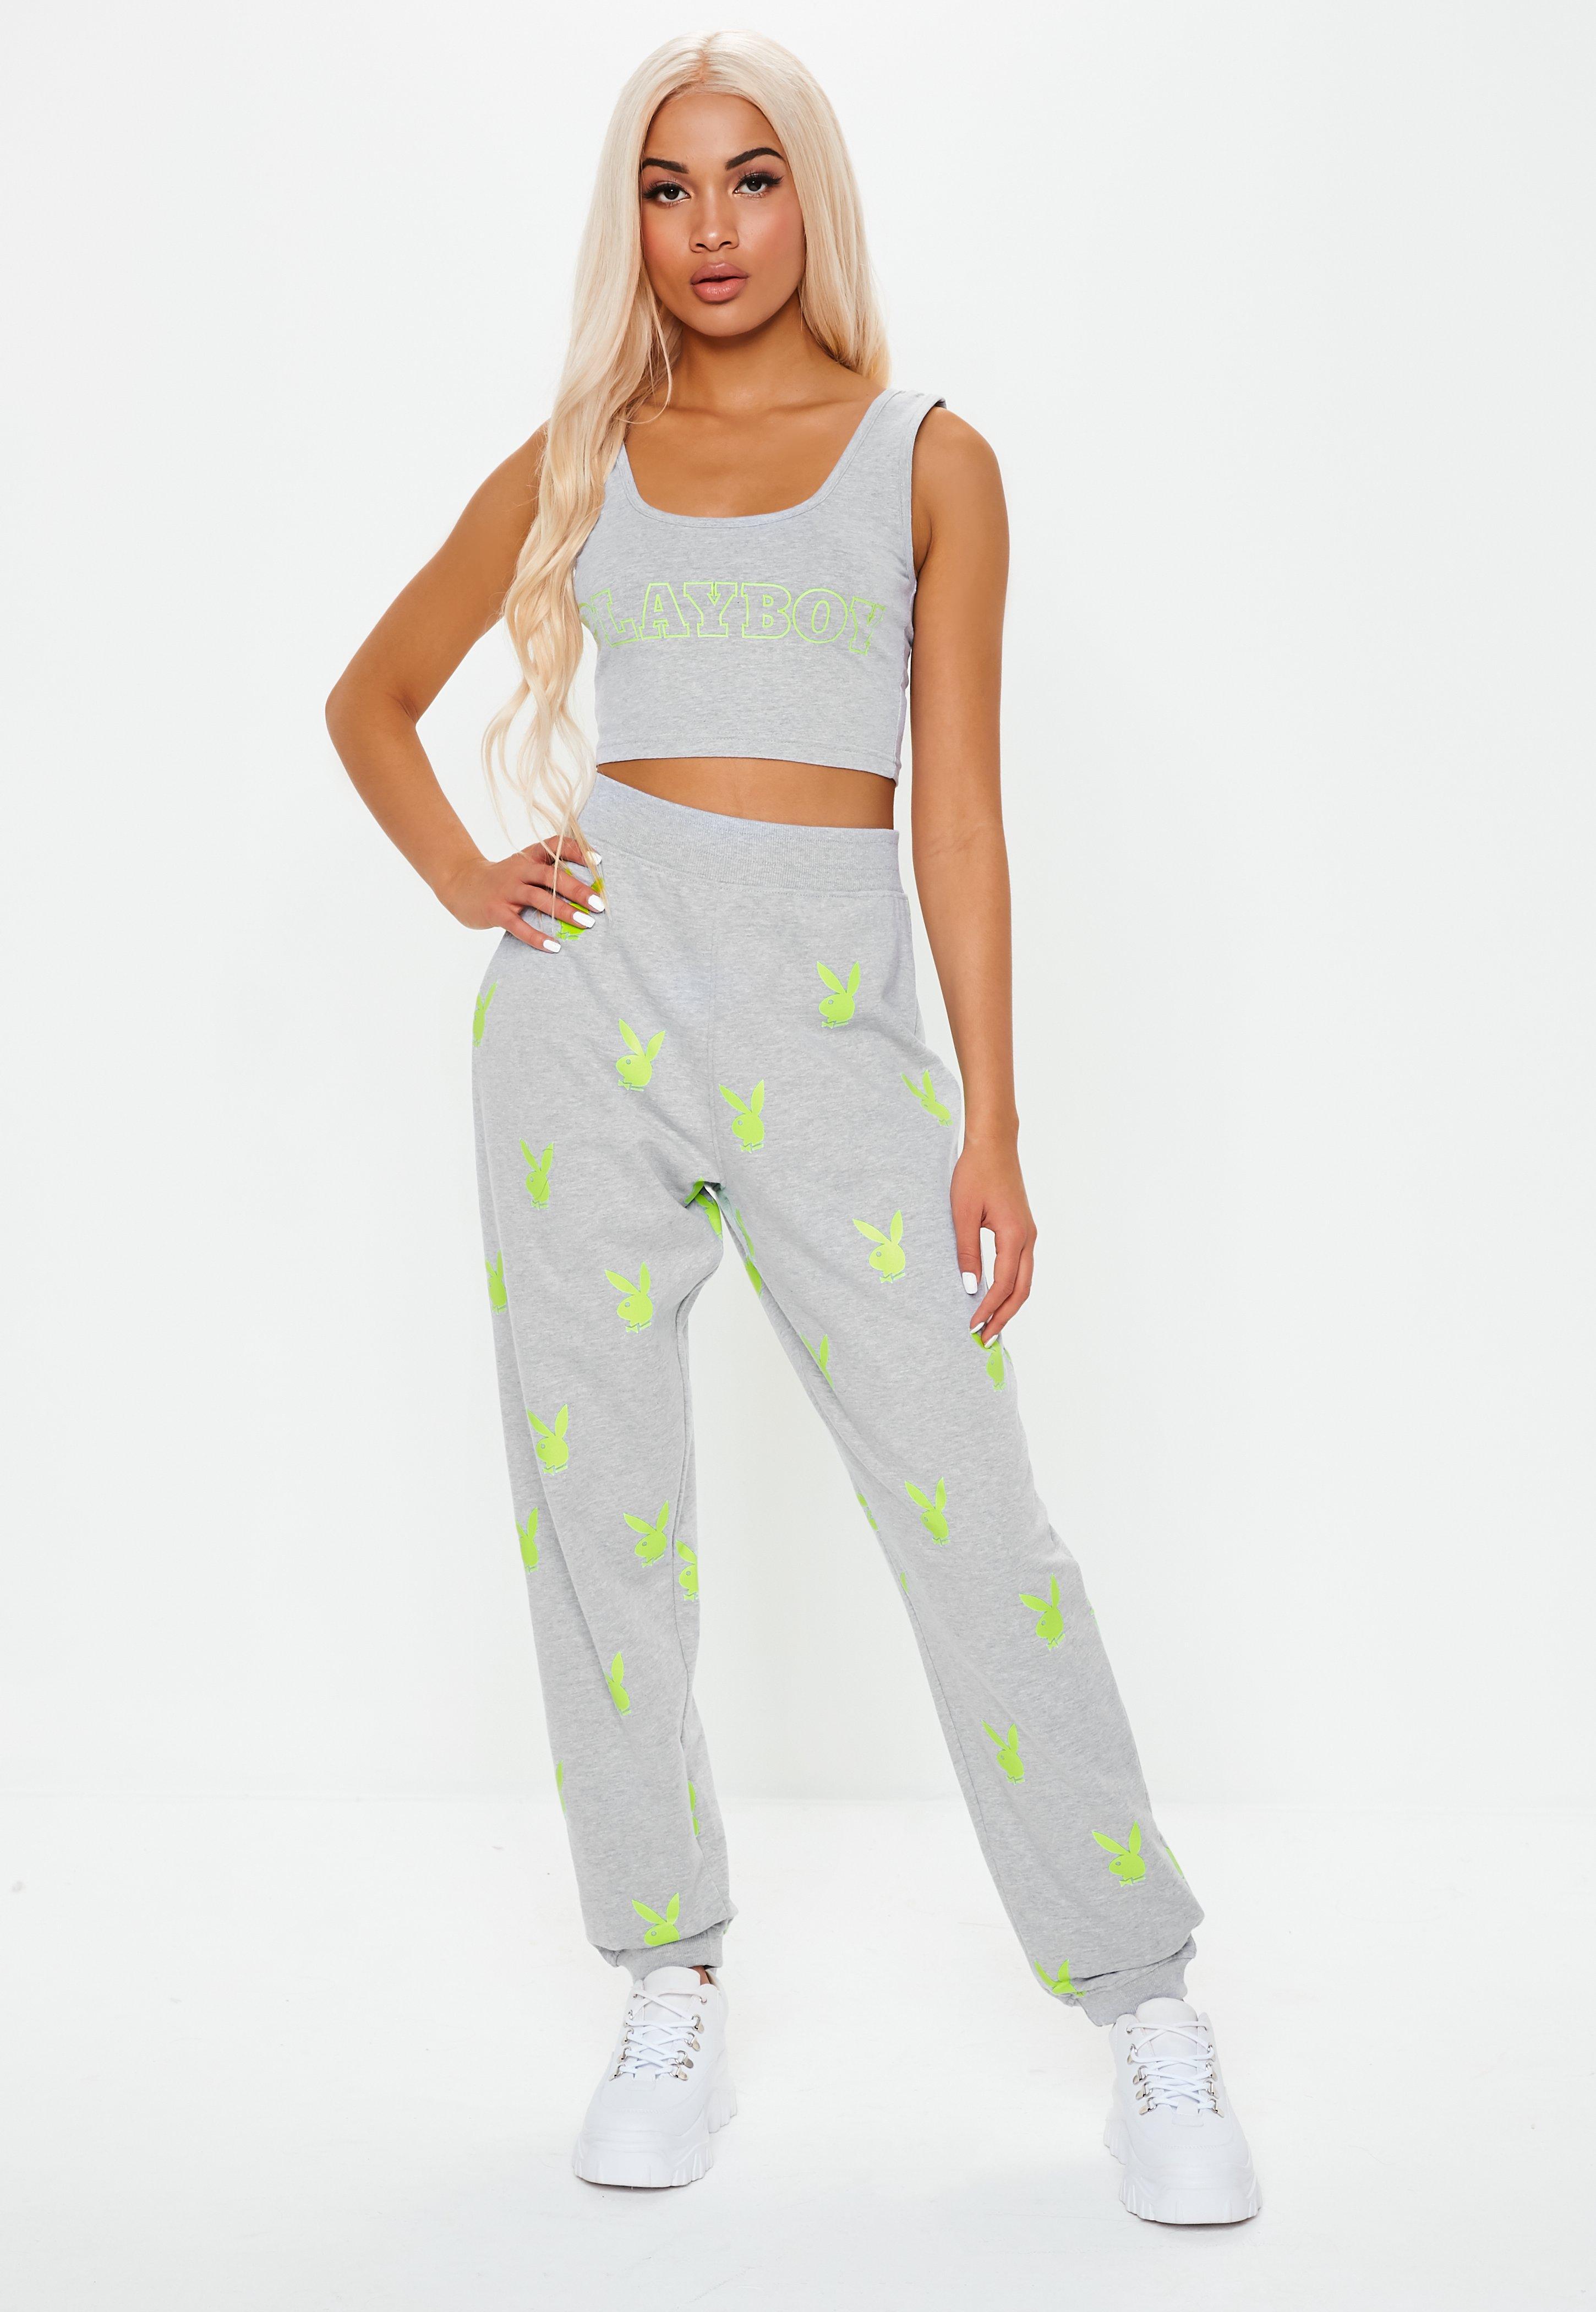 359e910d20422e Playboy Clothing